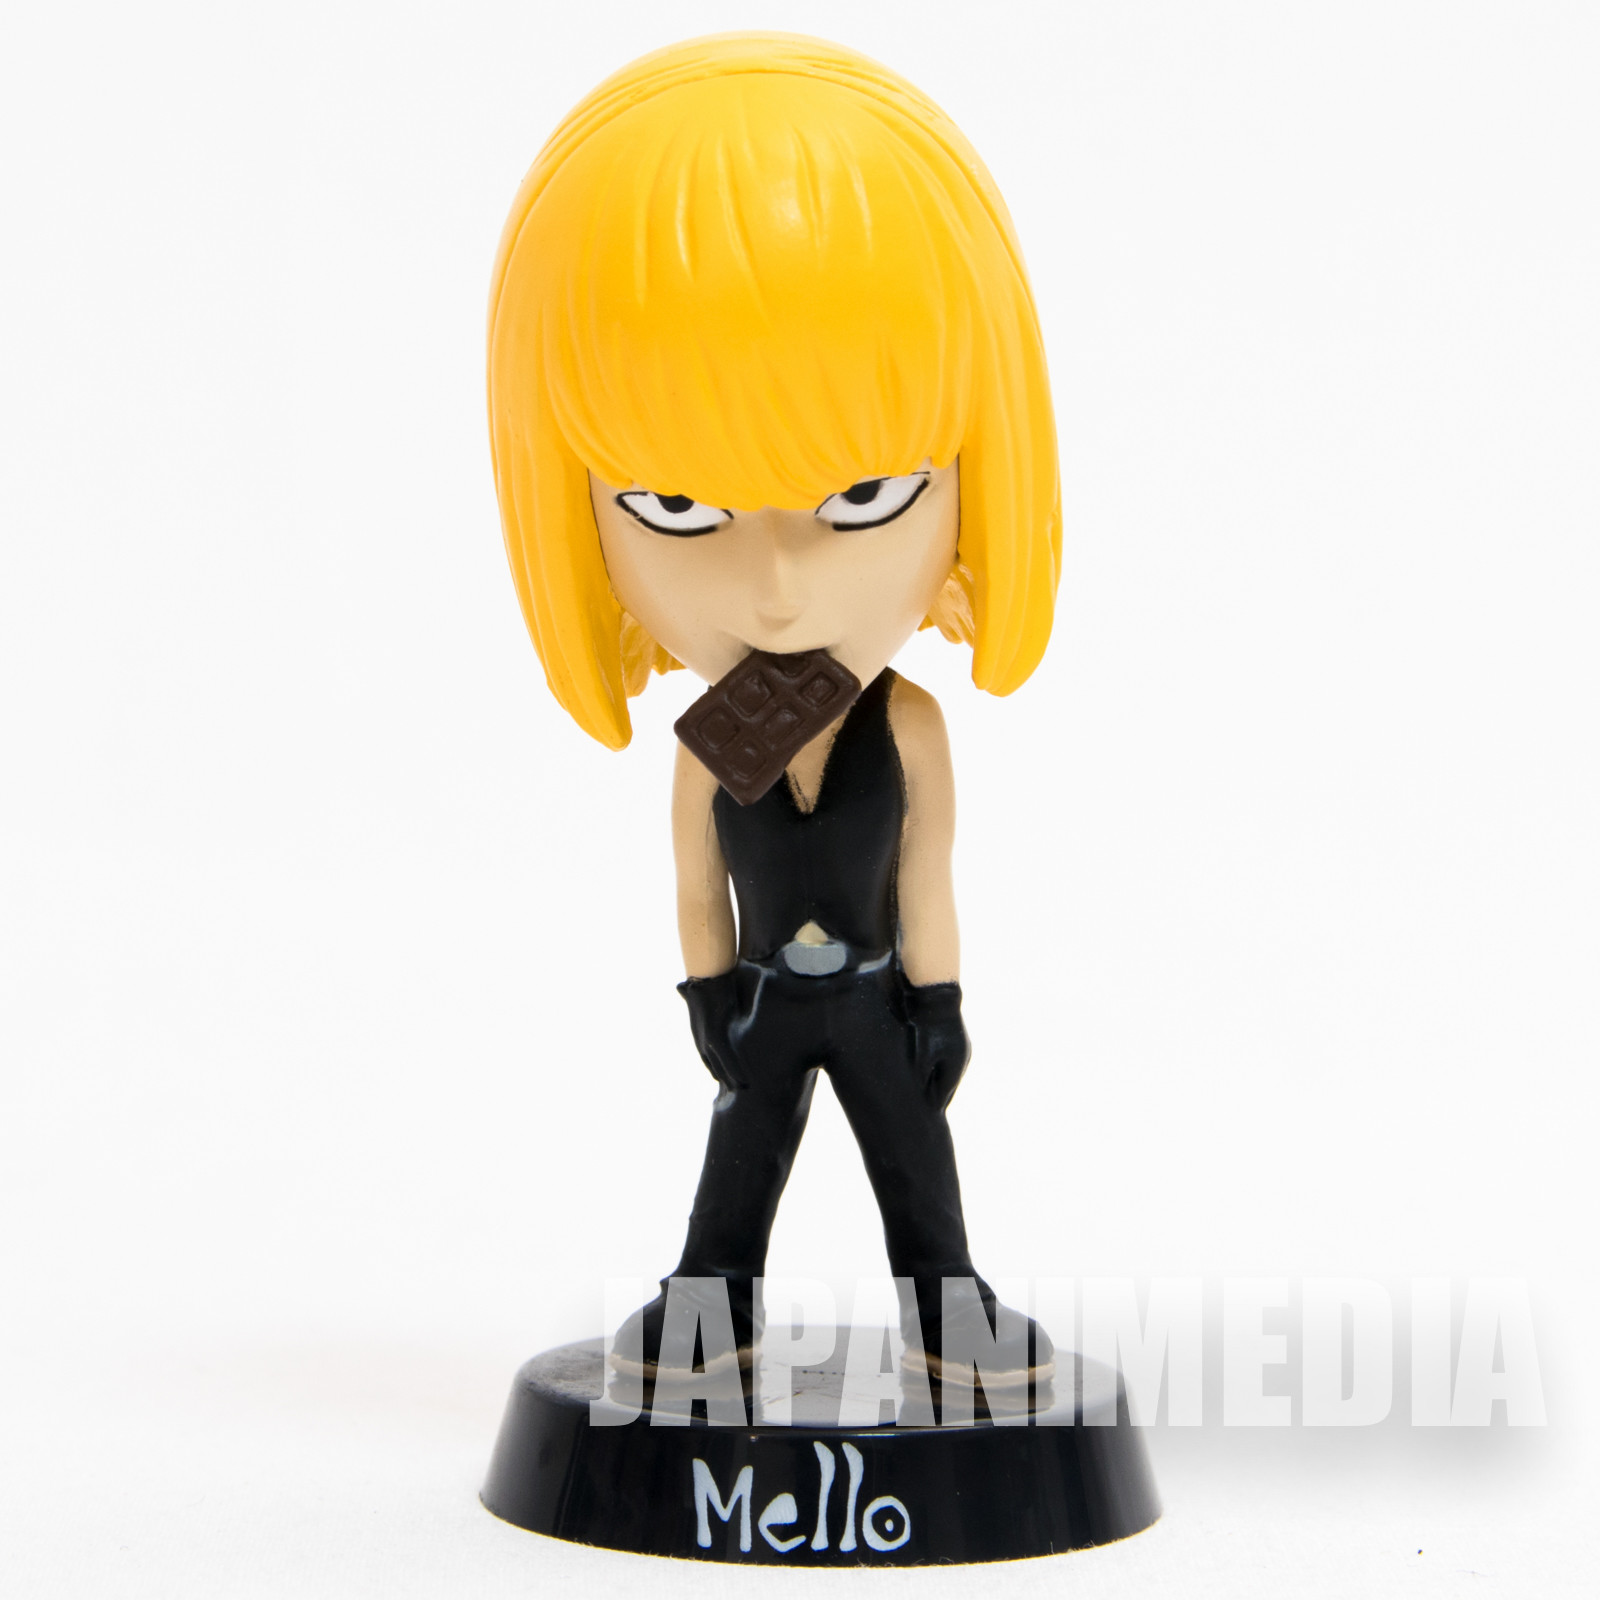 Death Note Mello Bobble Bobbin Head Figure JAPAN ANIME MANGA